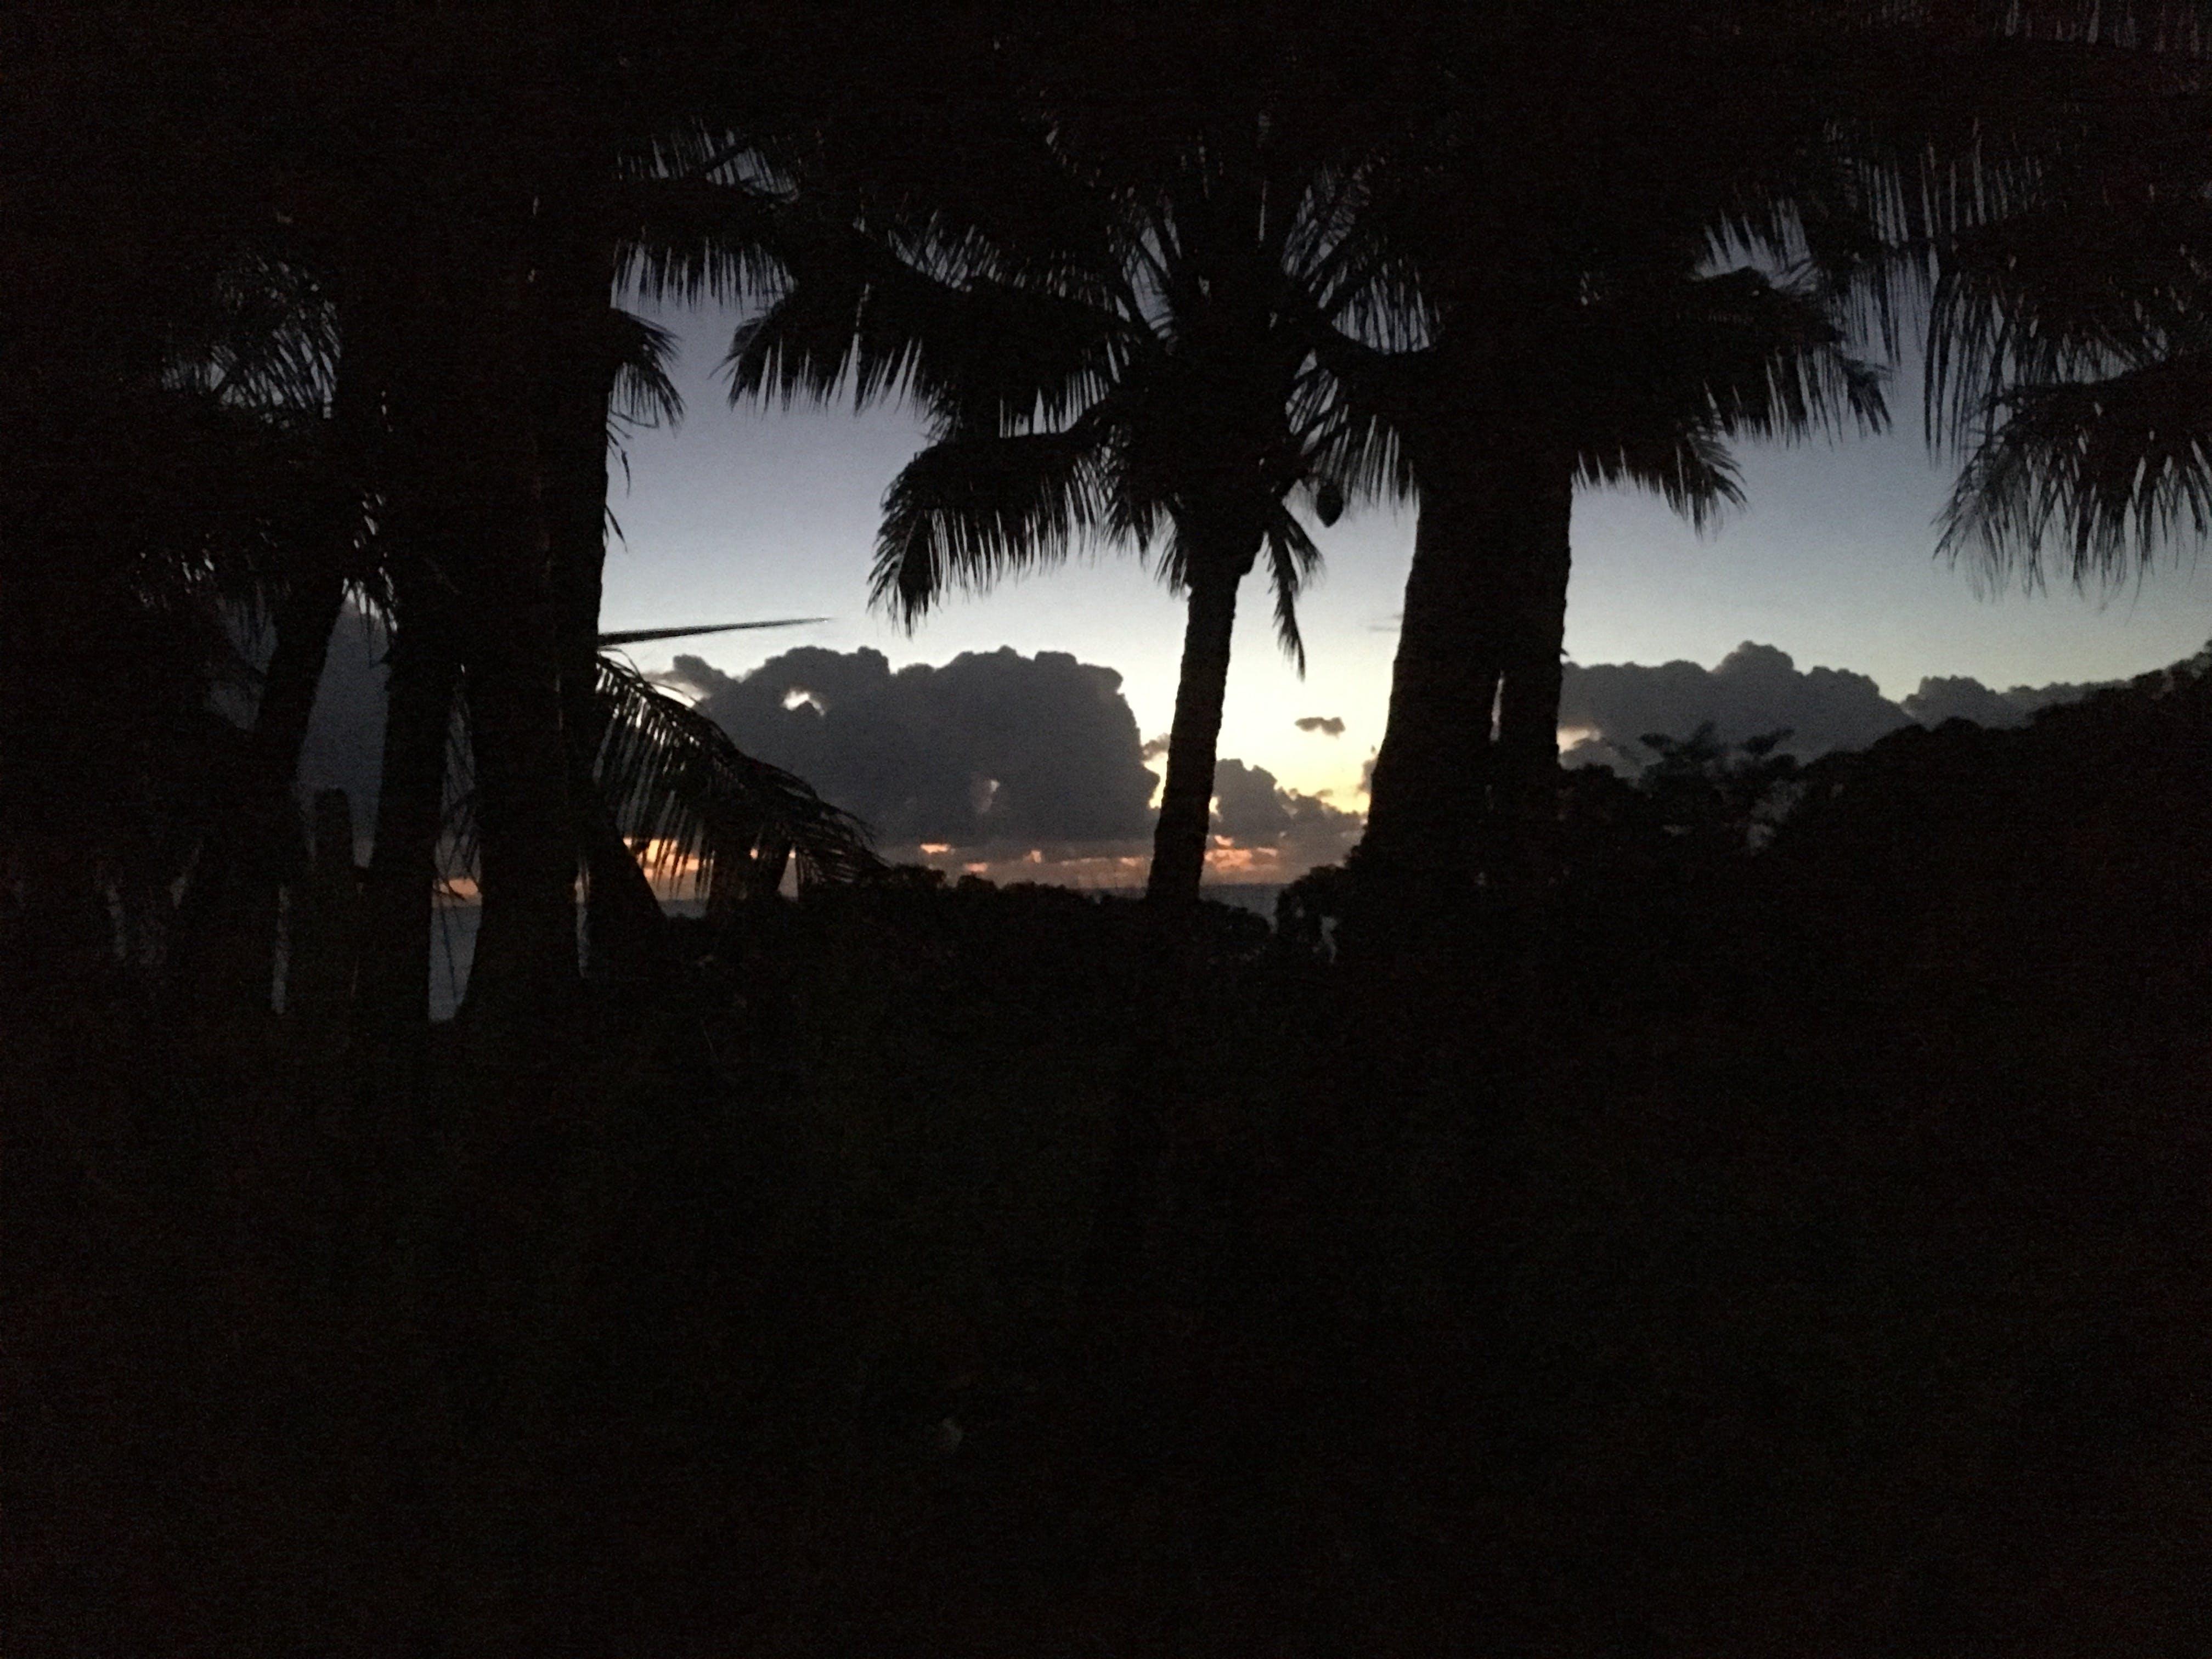 Free stock photo of hawaii, palm trees, shadows, silhouette